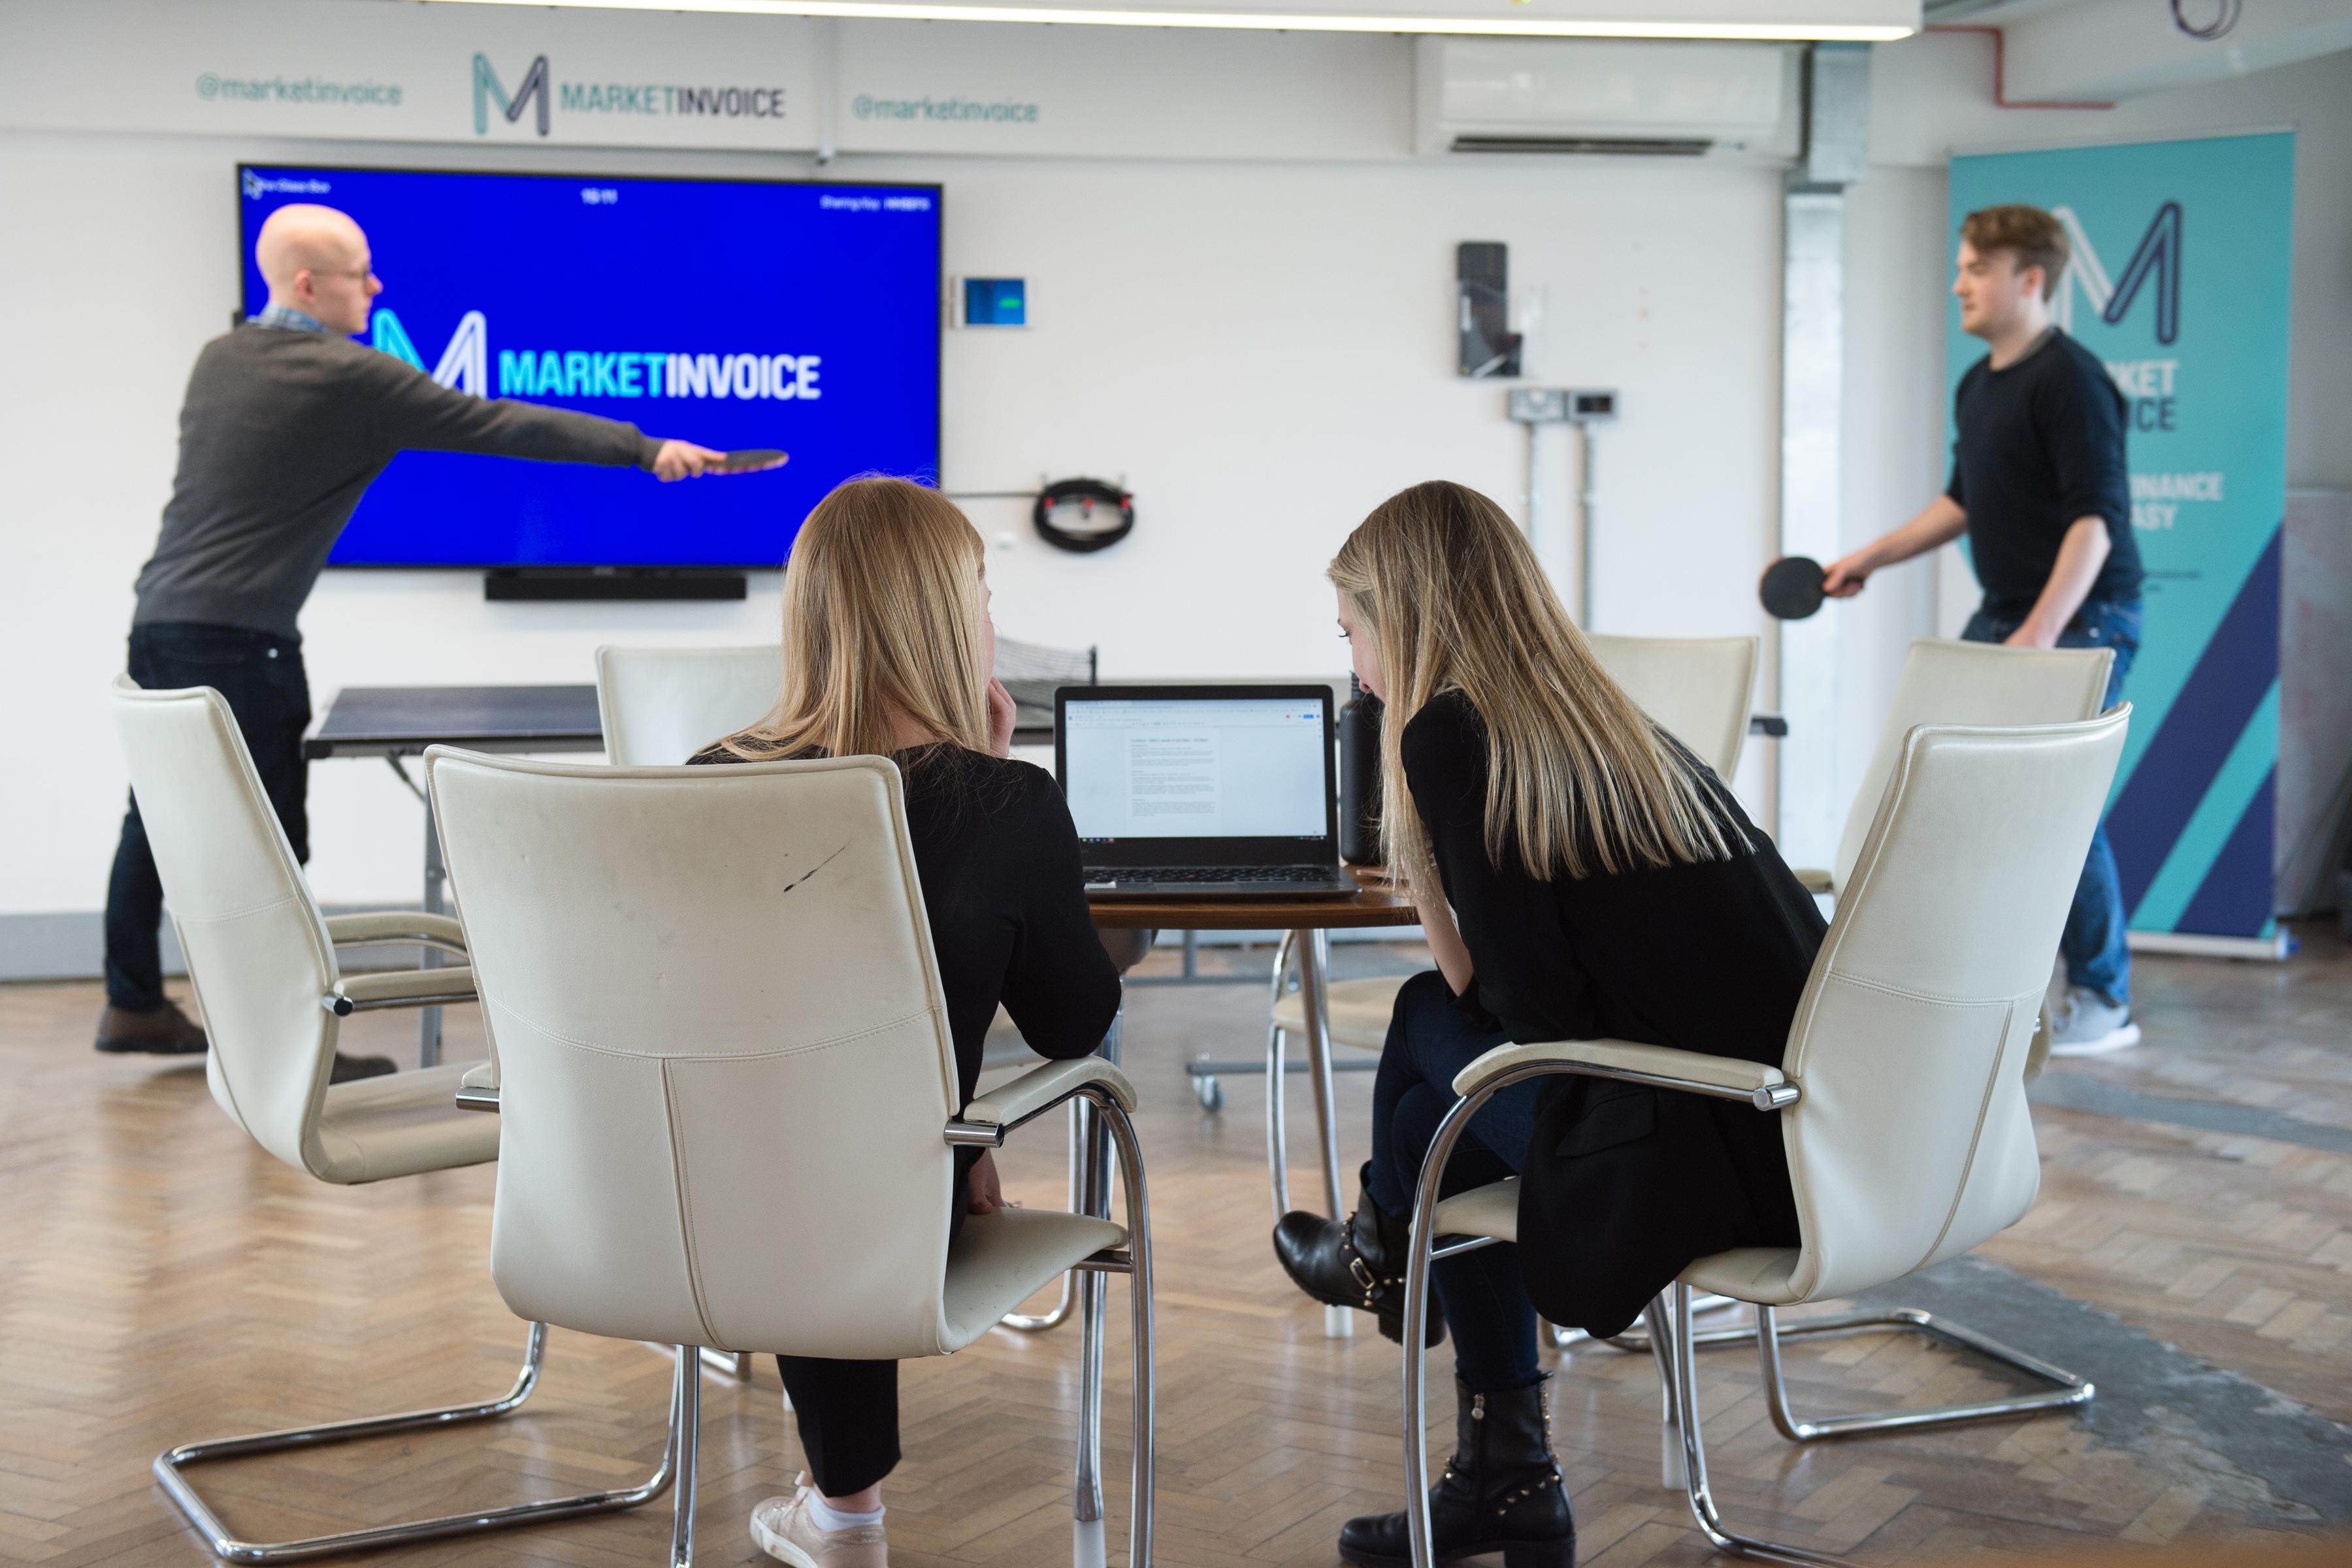 MarketInvoice Jobs & Careers | Jobbio